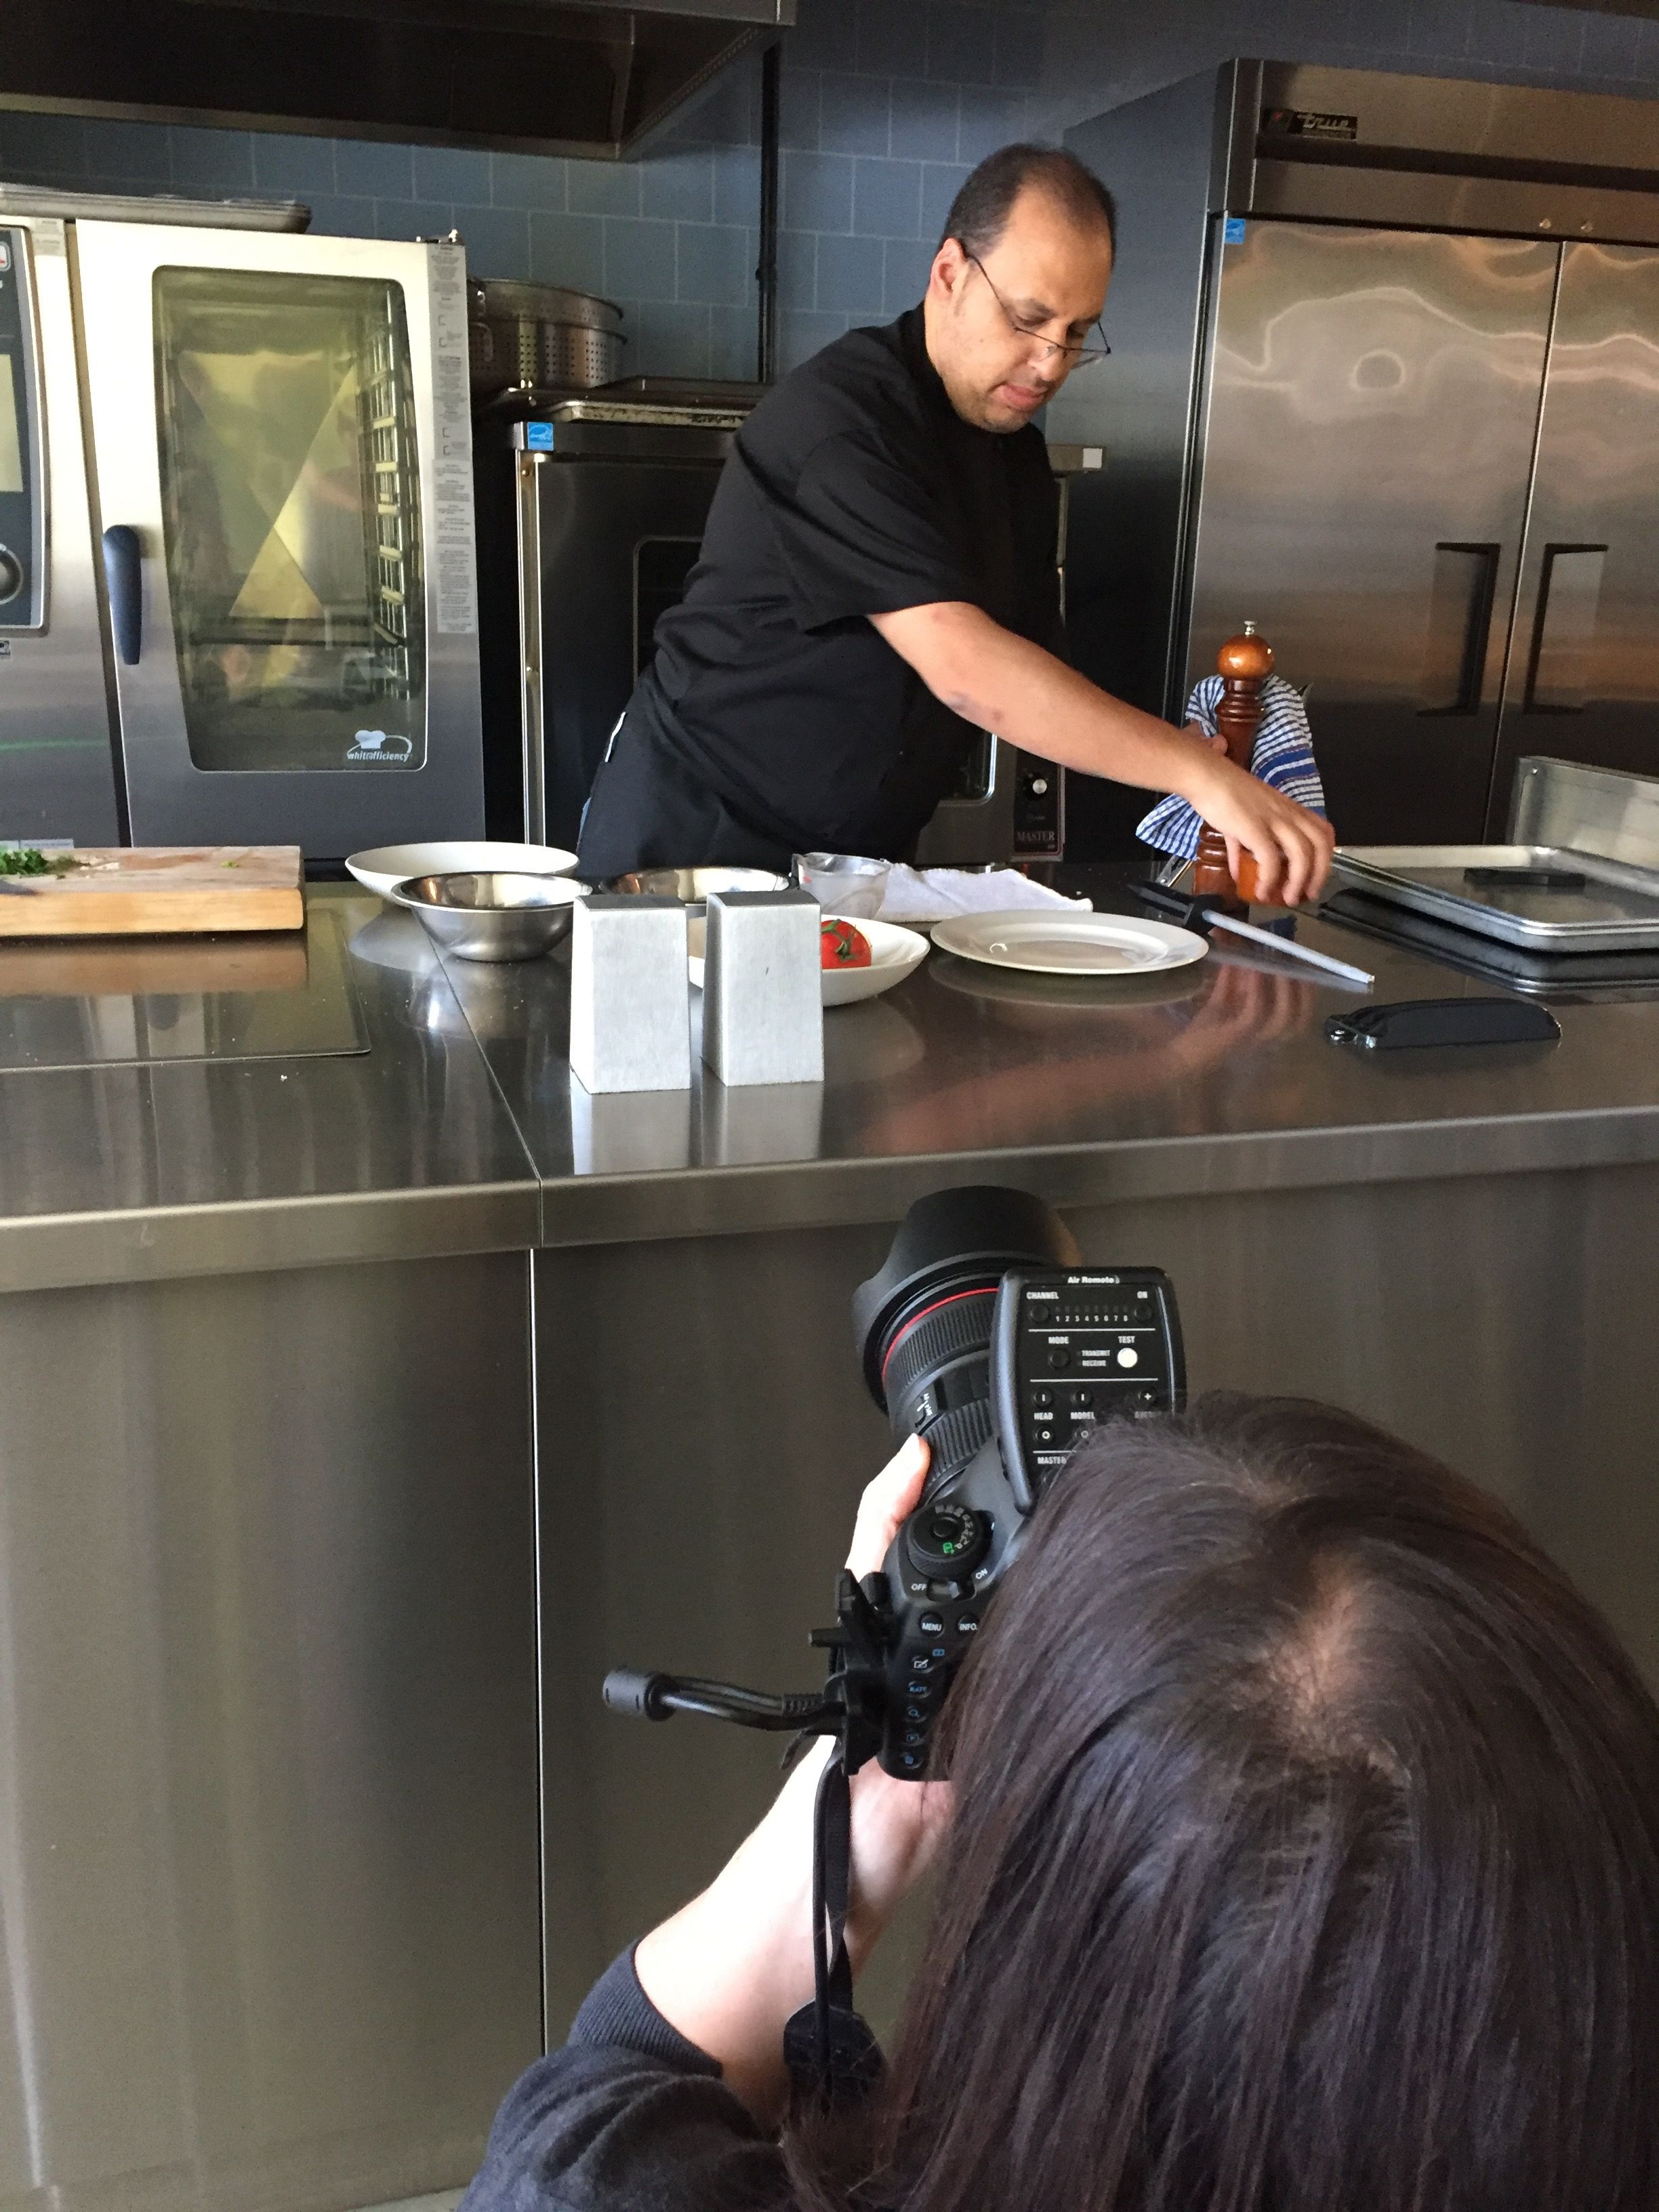 Test Kitchen Chef Head Chef Sam In Action Photoshoot In Our Test Kitchen Chef